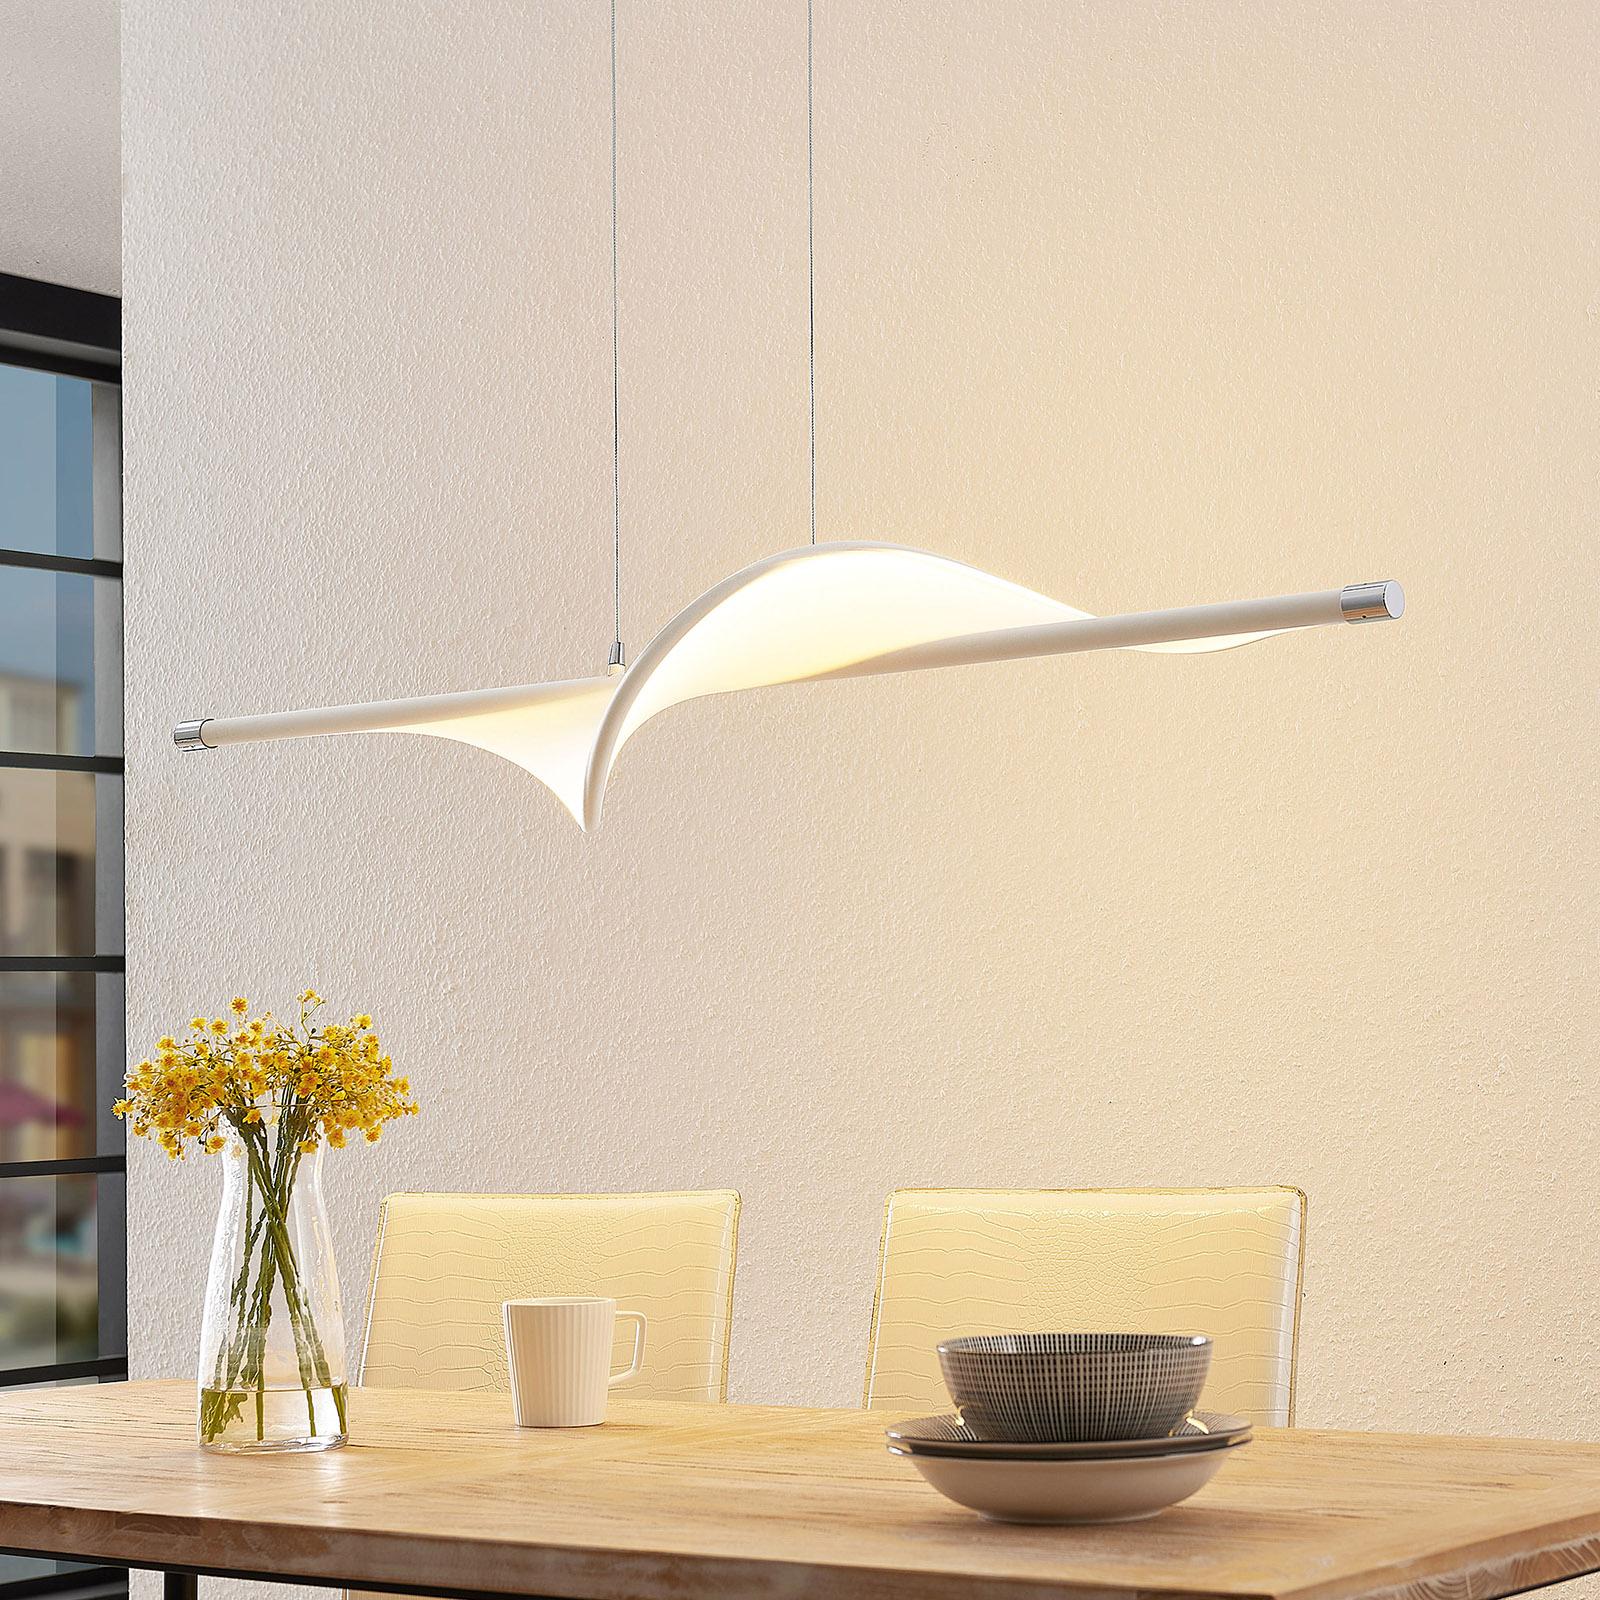 Lucande Edano lampa wisząca LED, 3 stopniowa